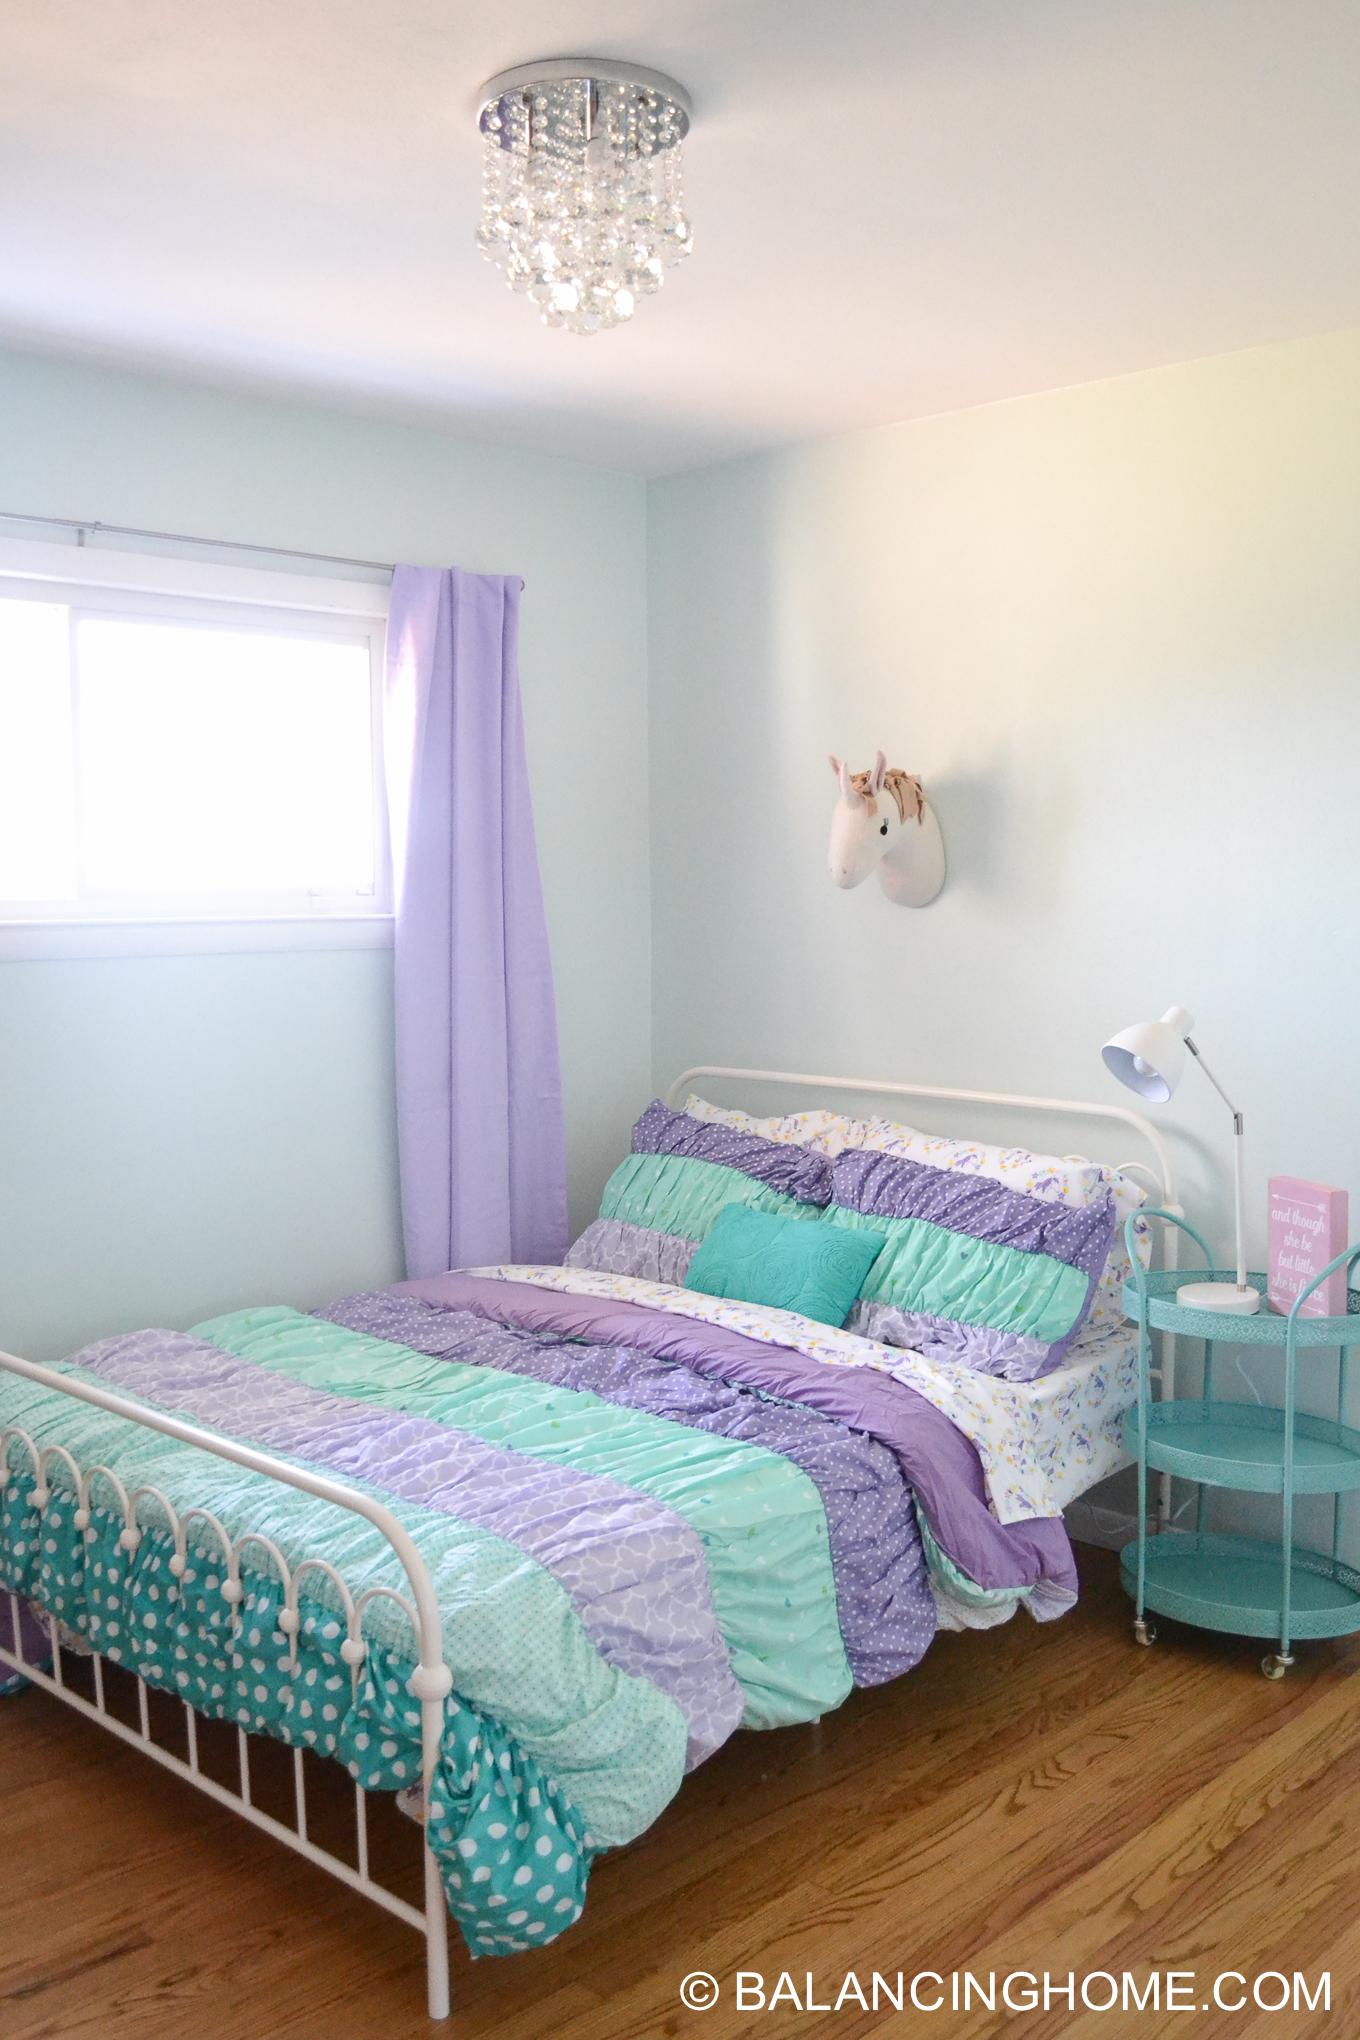 Small Bedroom Decor & Bedroom Decorating Ideas - Balancing ... on Small Bedroom Ideas For Women  id=17685